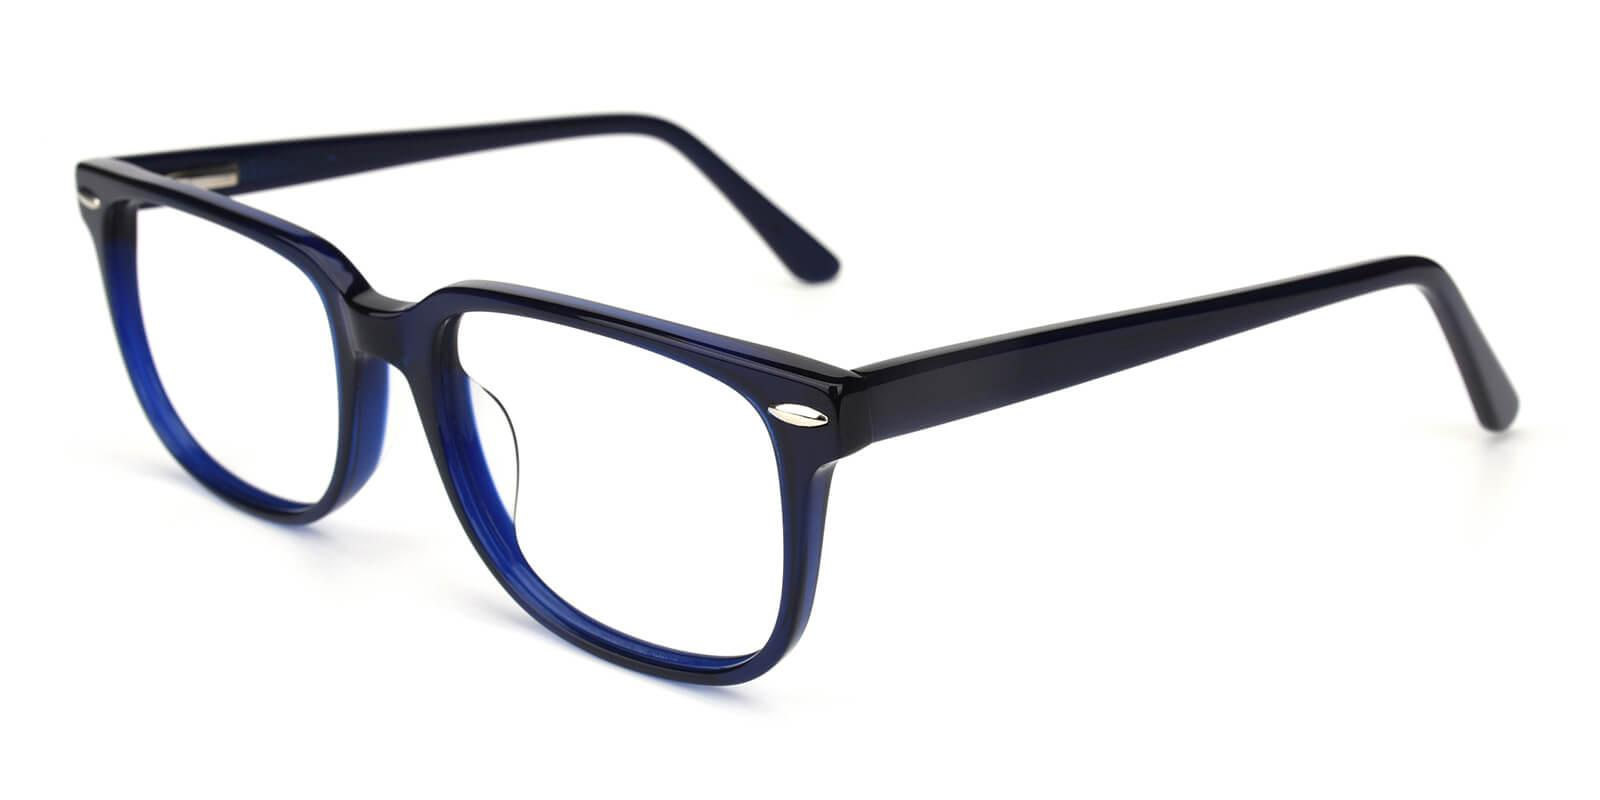 Tempiry-Blue-Rectangle-Acetate-Eyeglasses-additional1